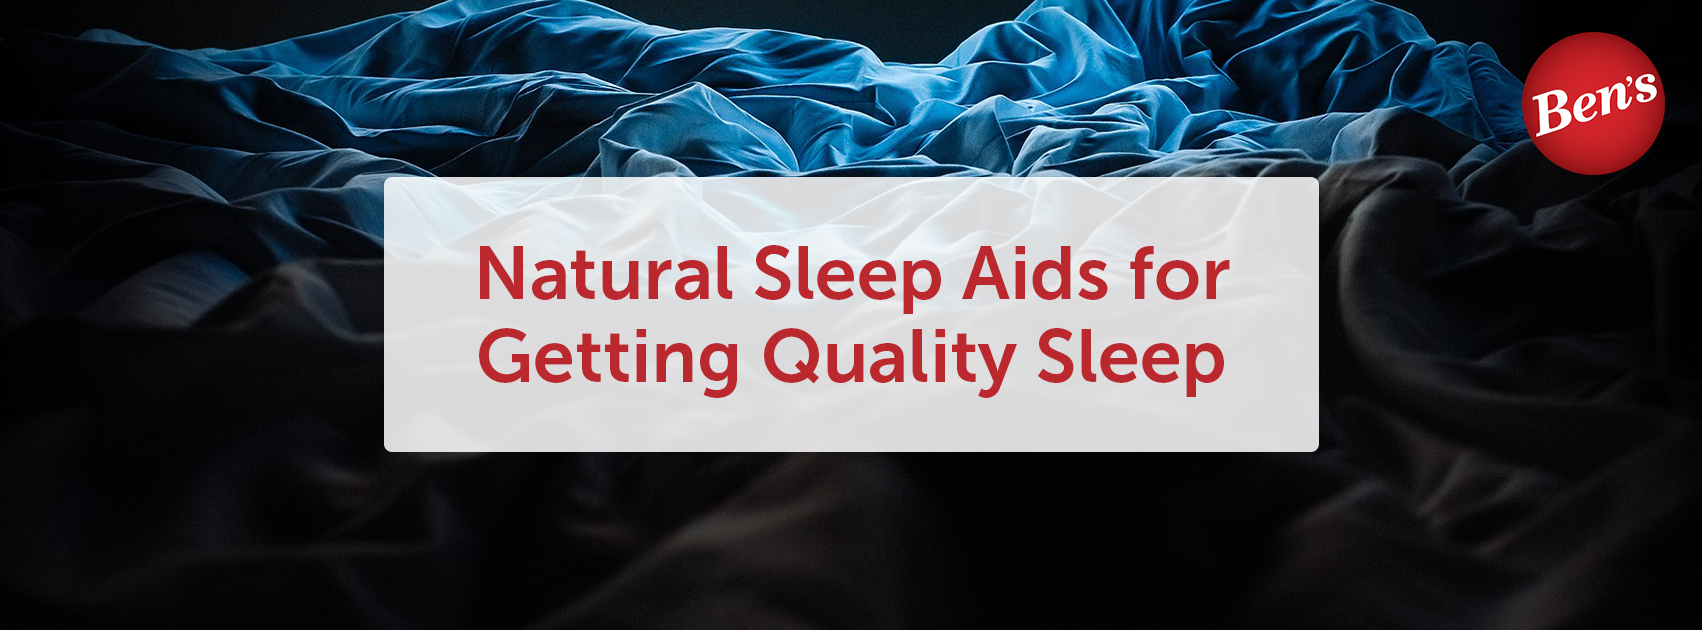 Natural Sleep Aids for Getting Quality Sleep